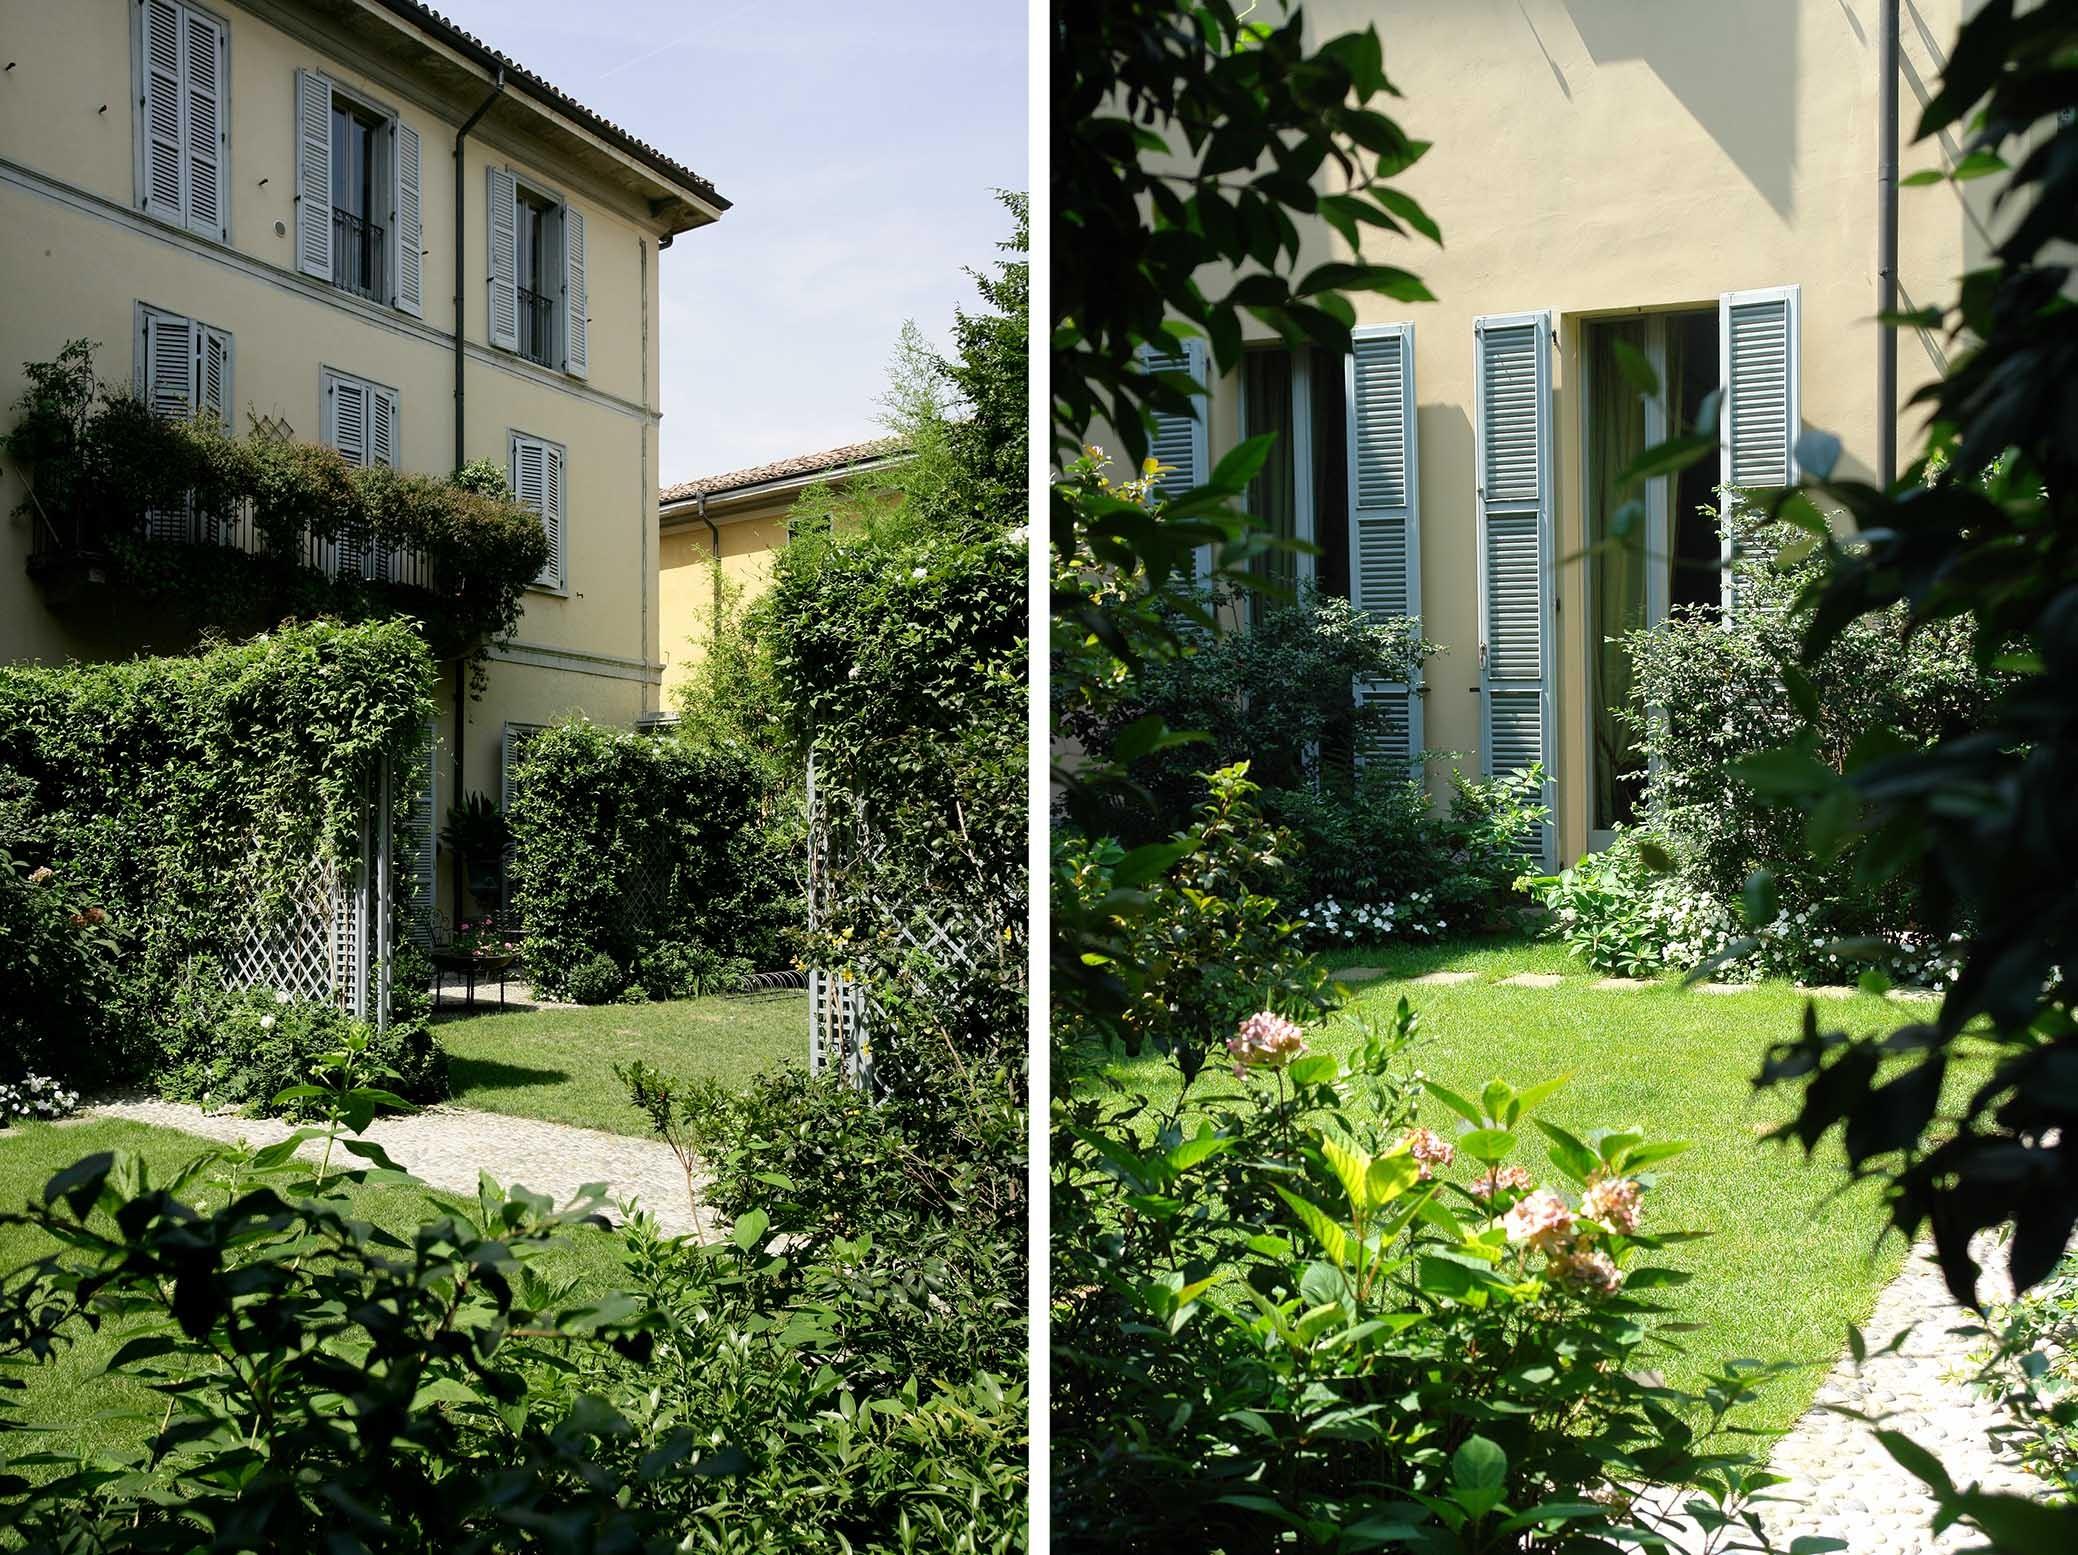 Piazzale verde - Giardini